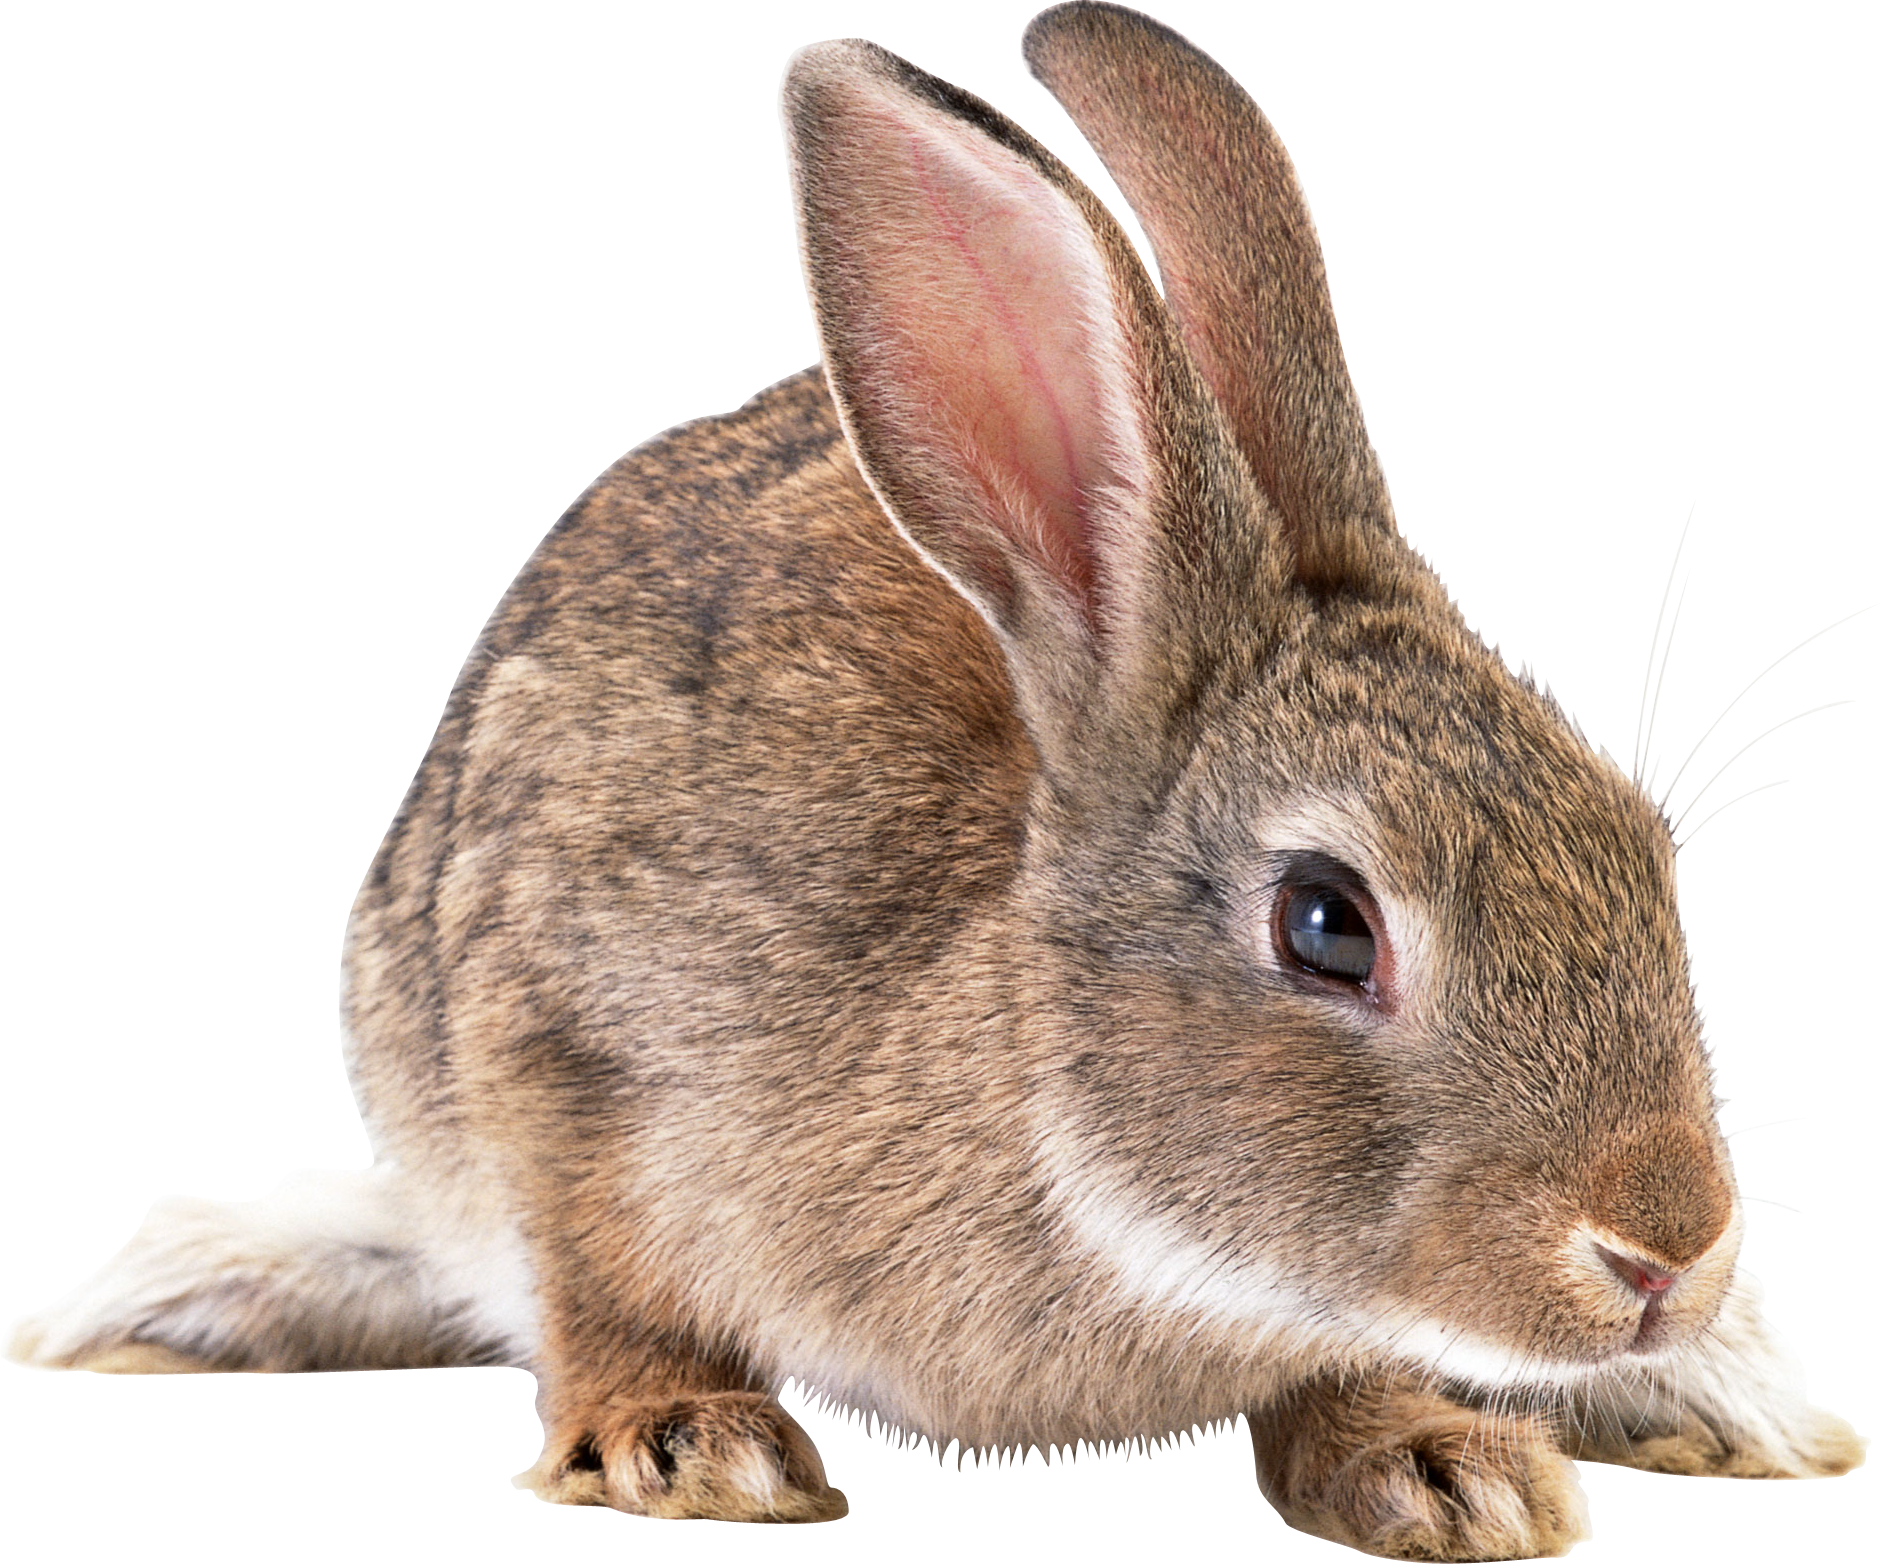 Rabbit Png image #40325